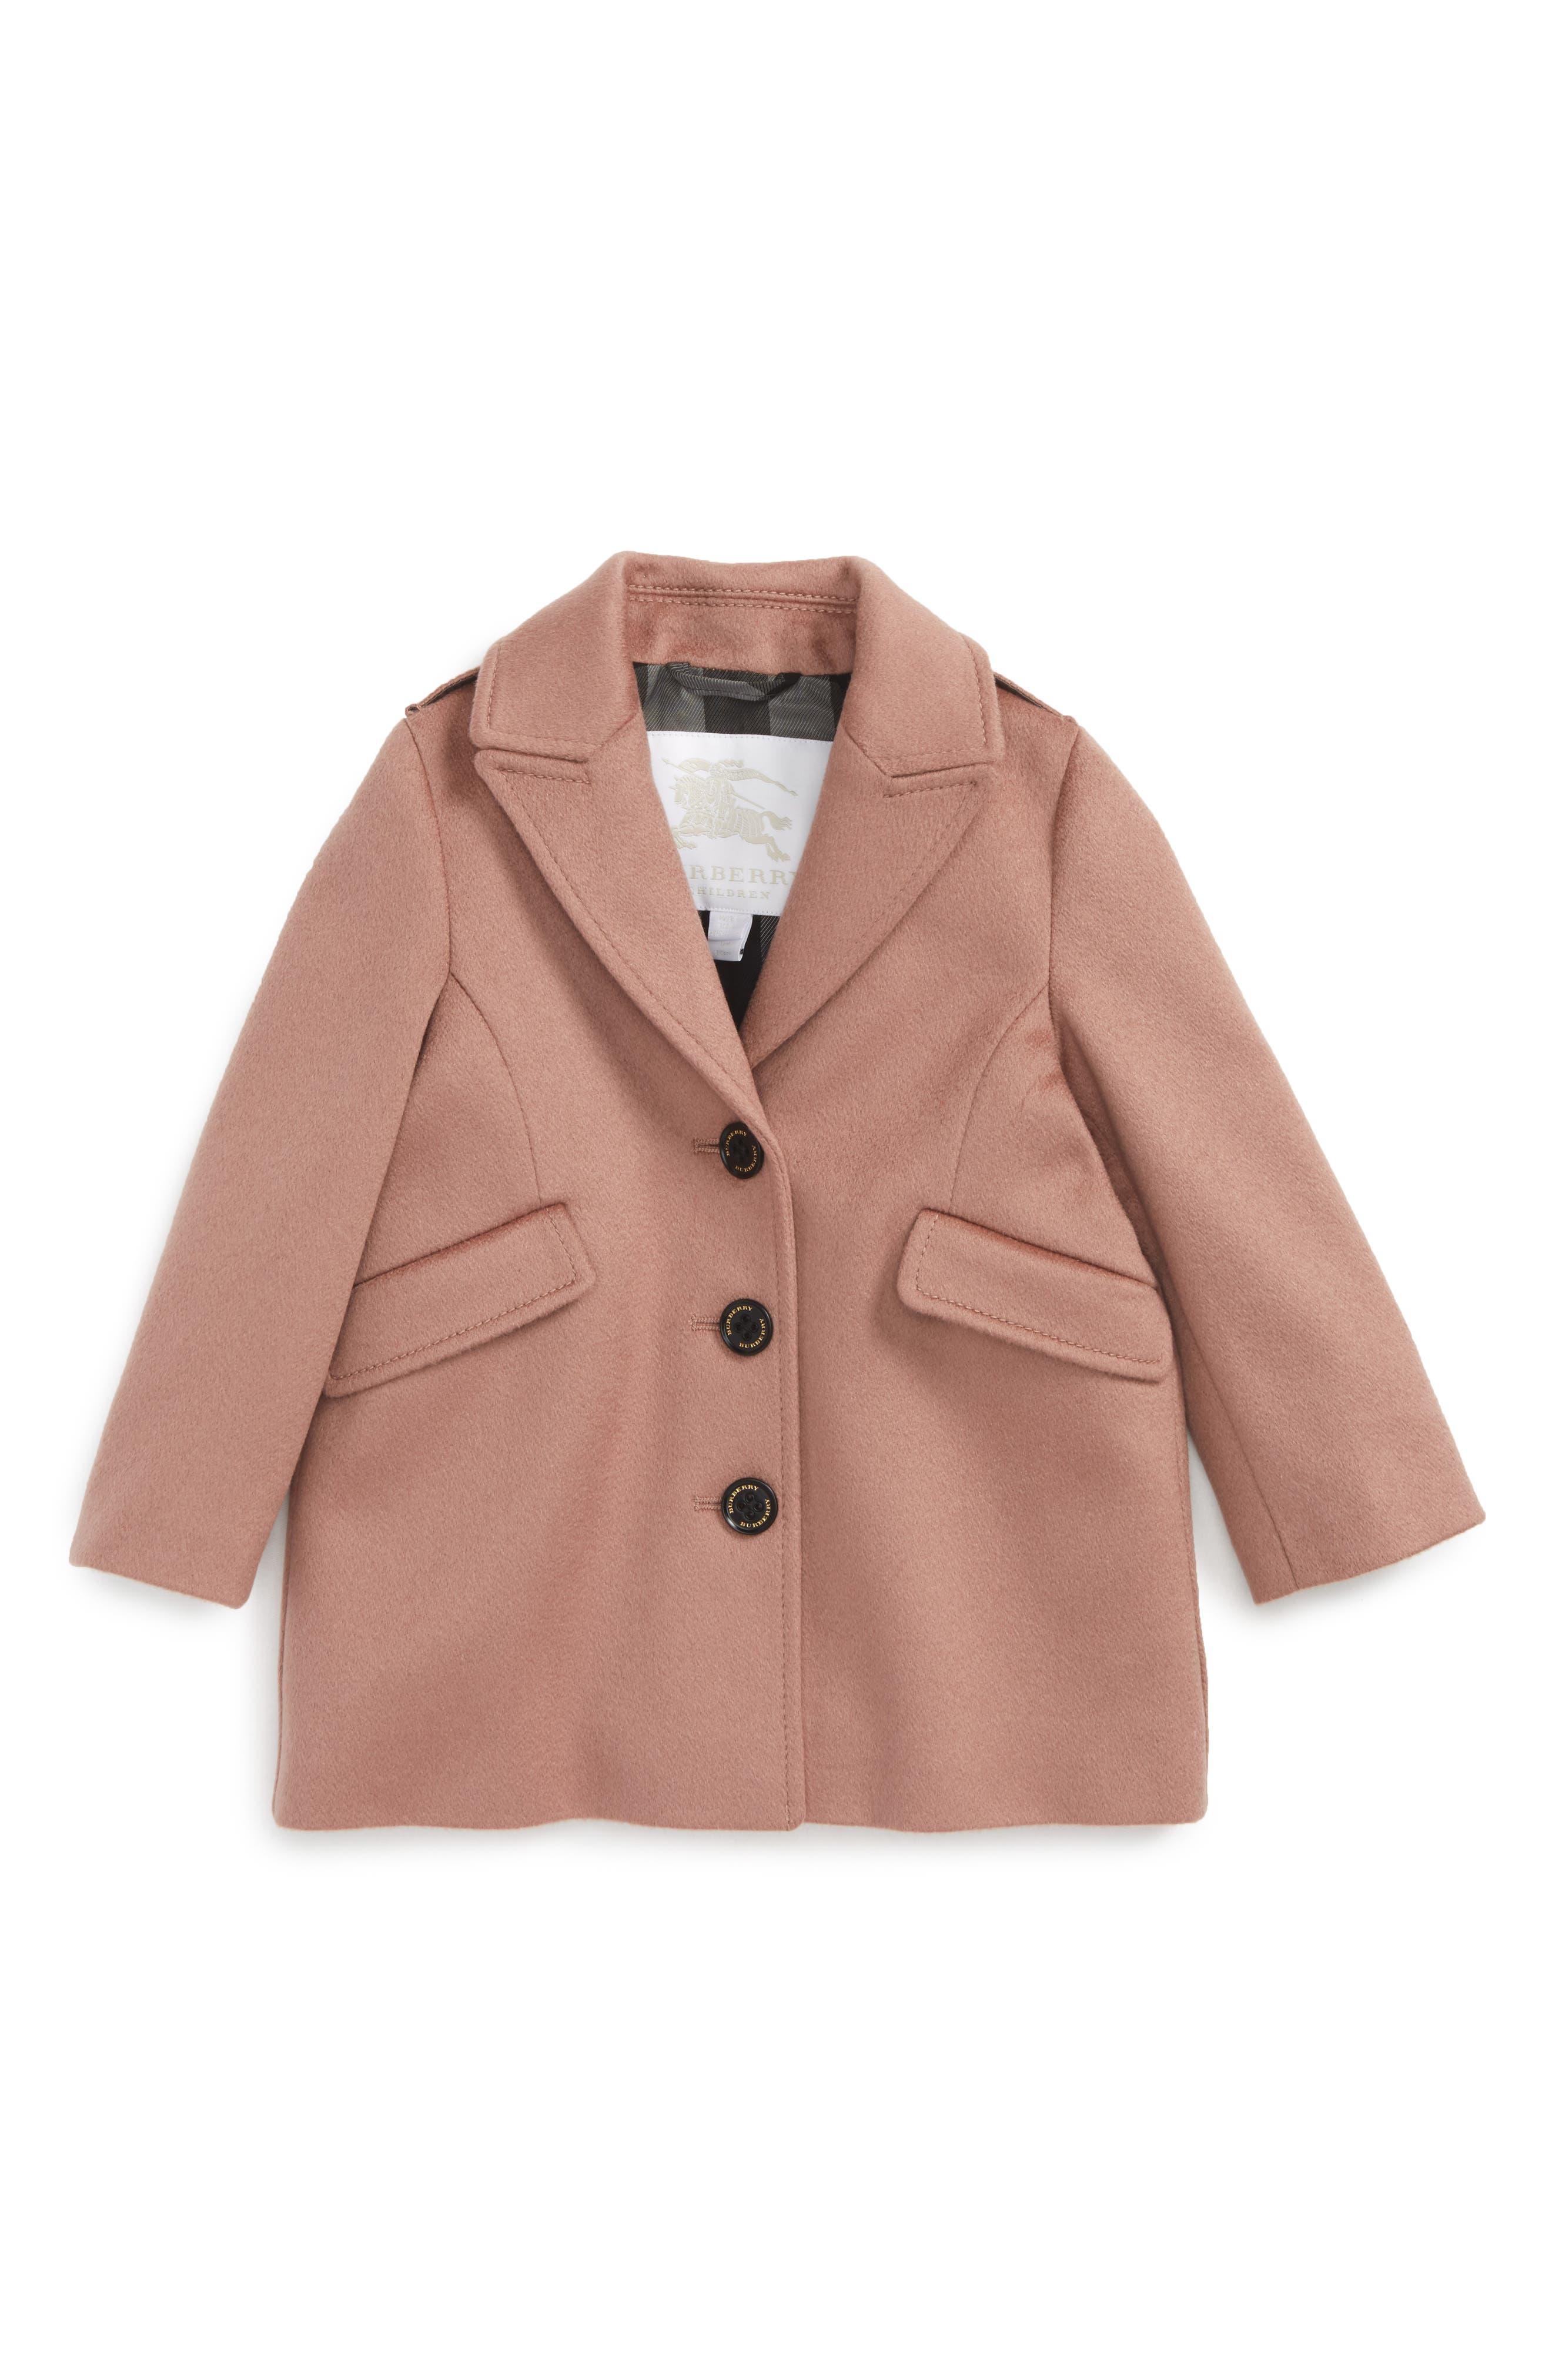 Main Image - Burberry Mini Bridget Cashmere Coat (Baby Girls)